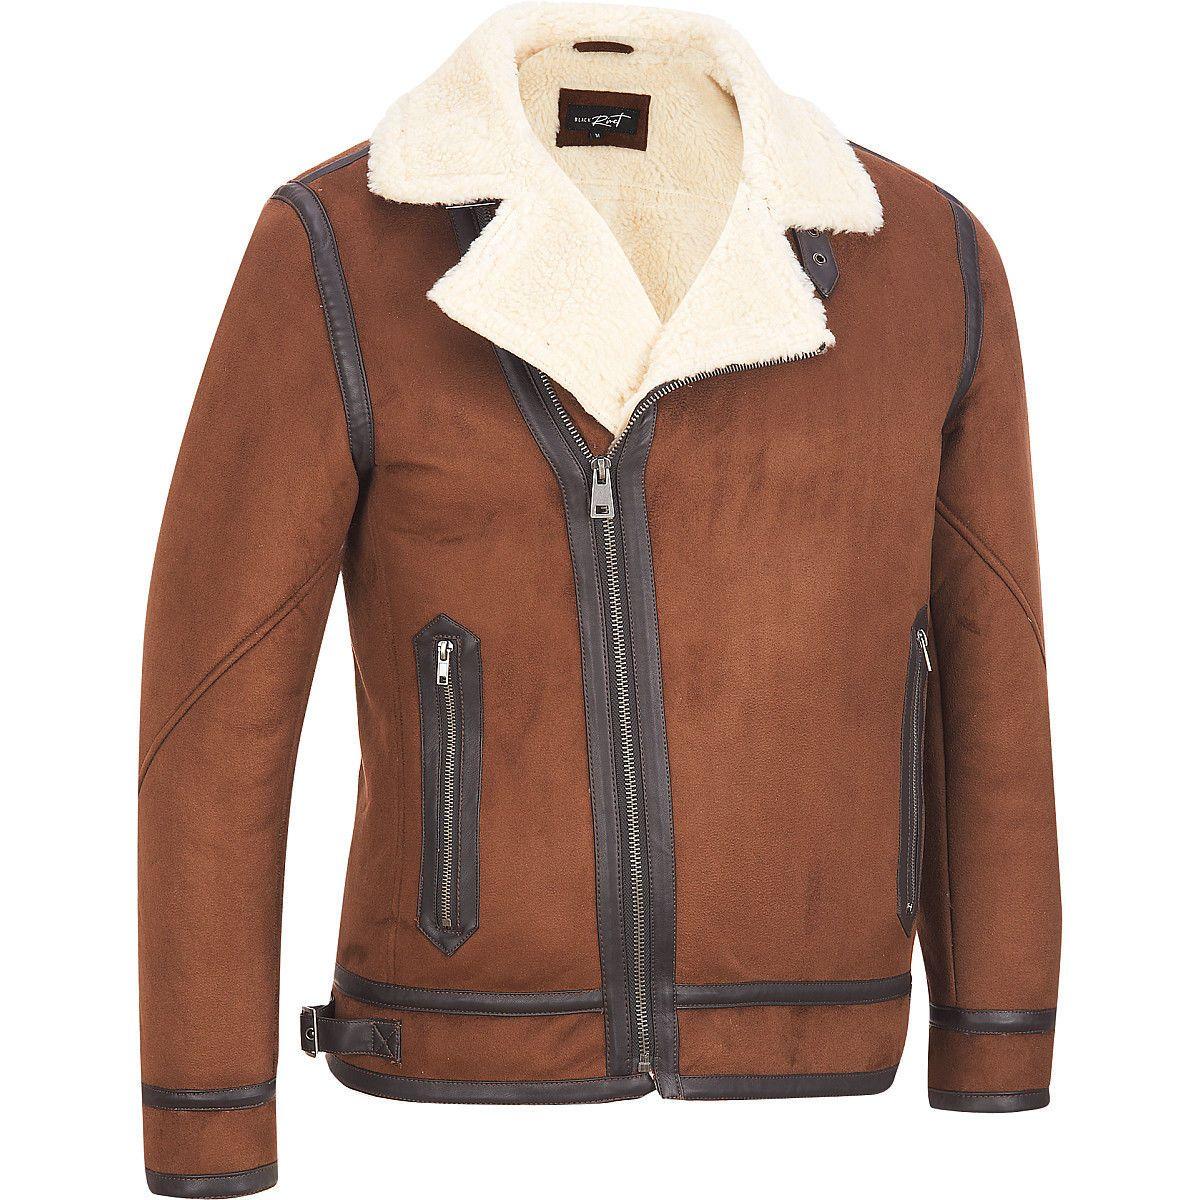 Men's Black Rivet Faux-Suede Jacket w/ Faux-Shearling Collar